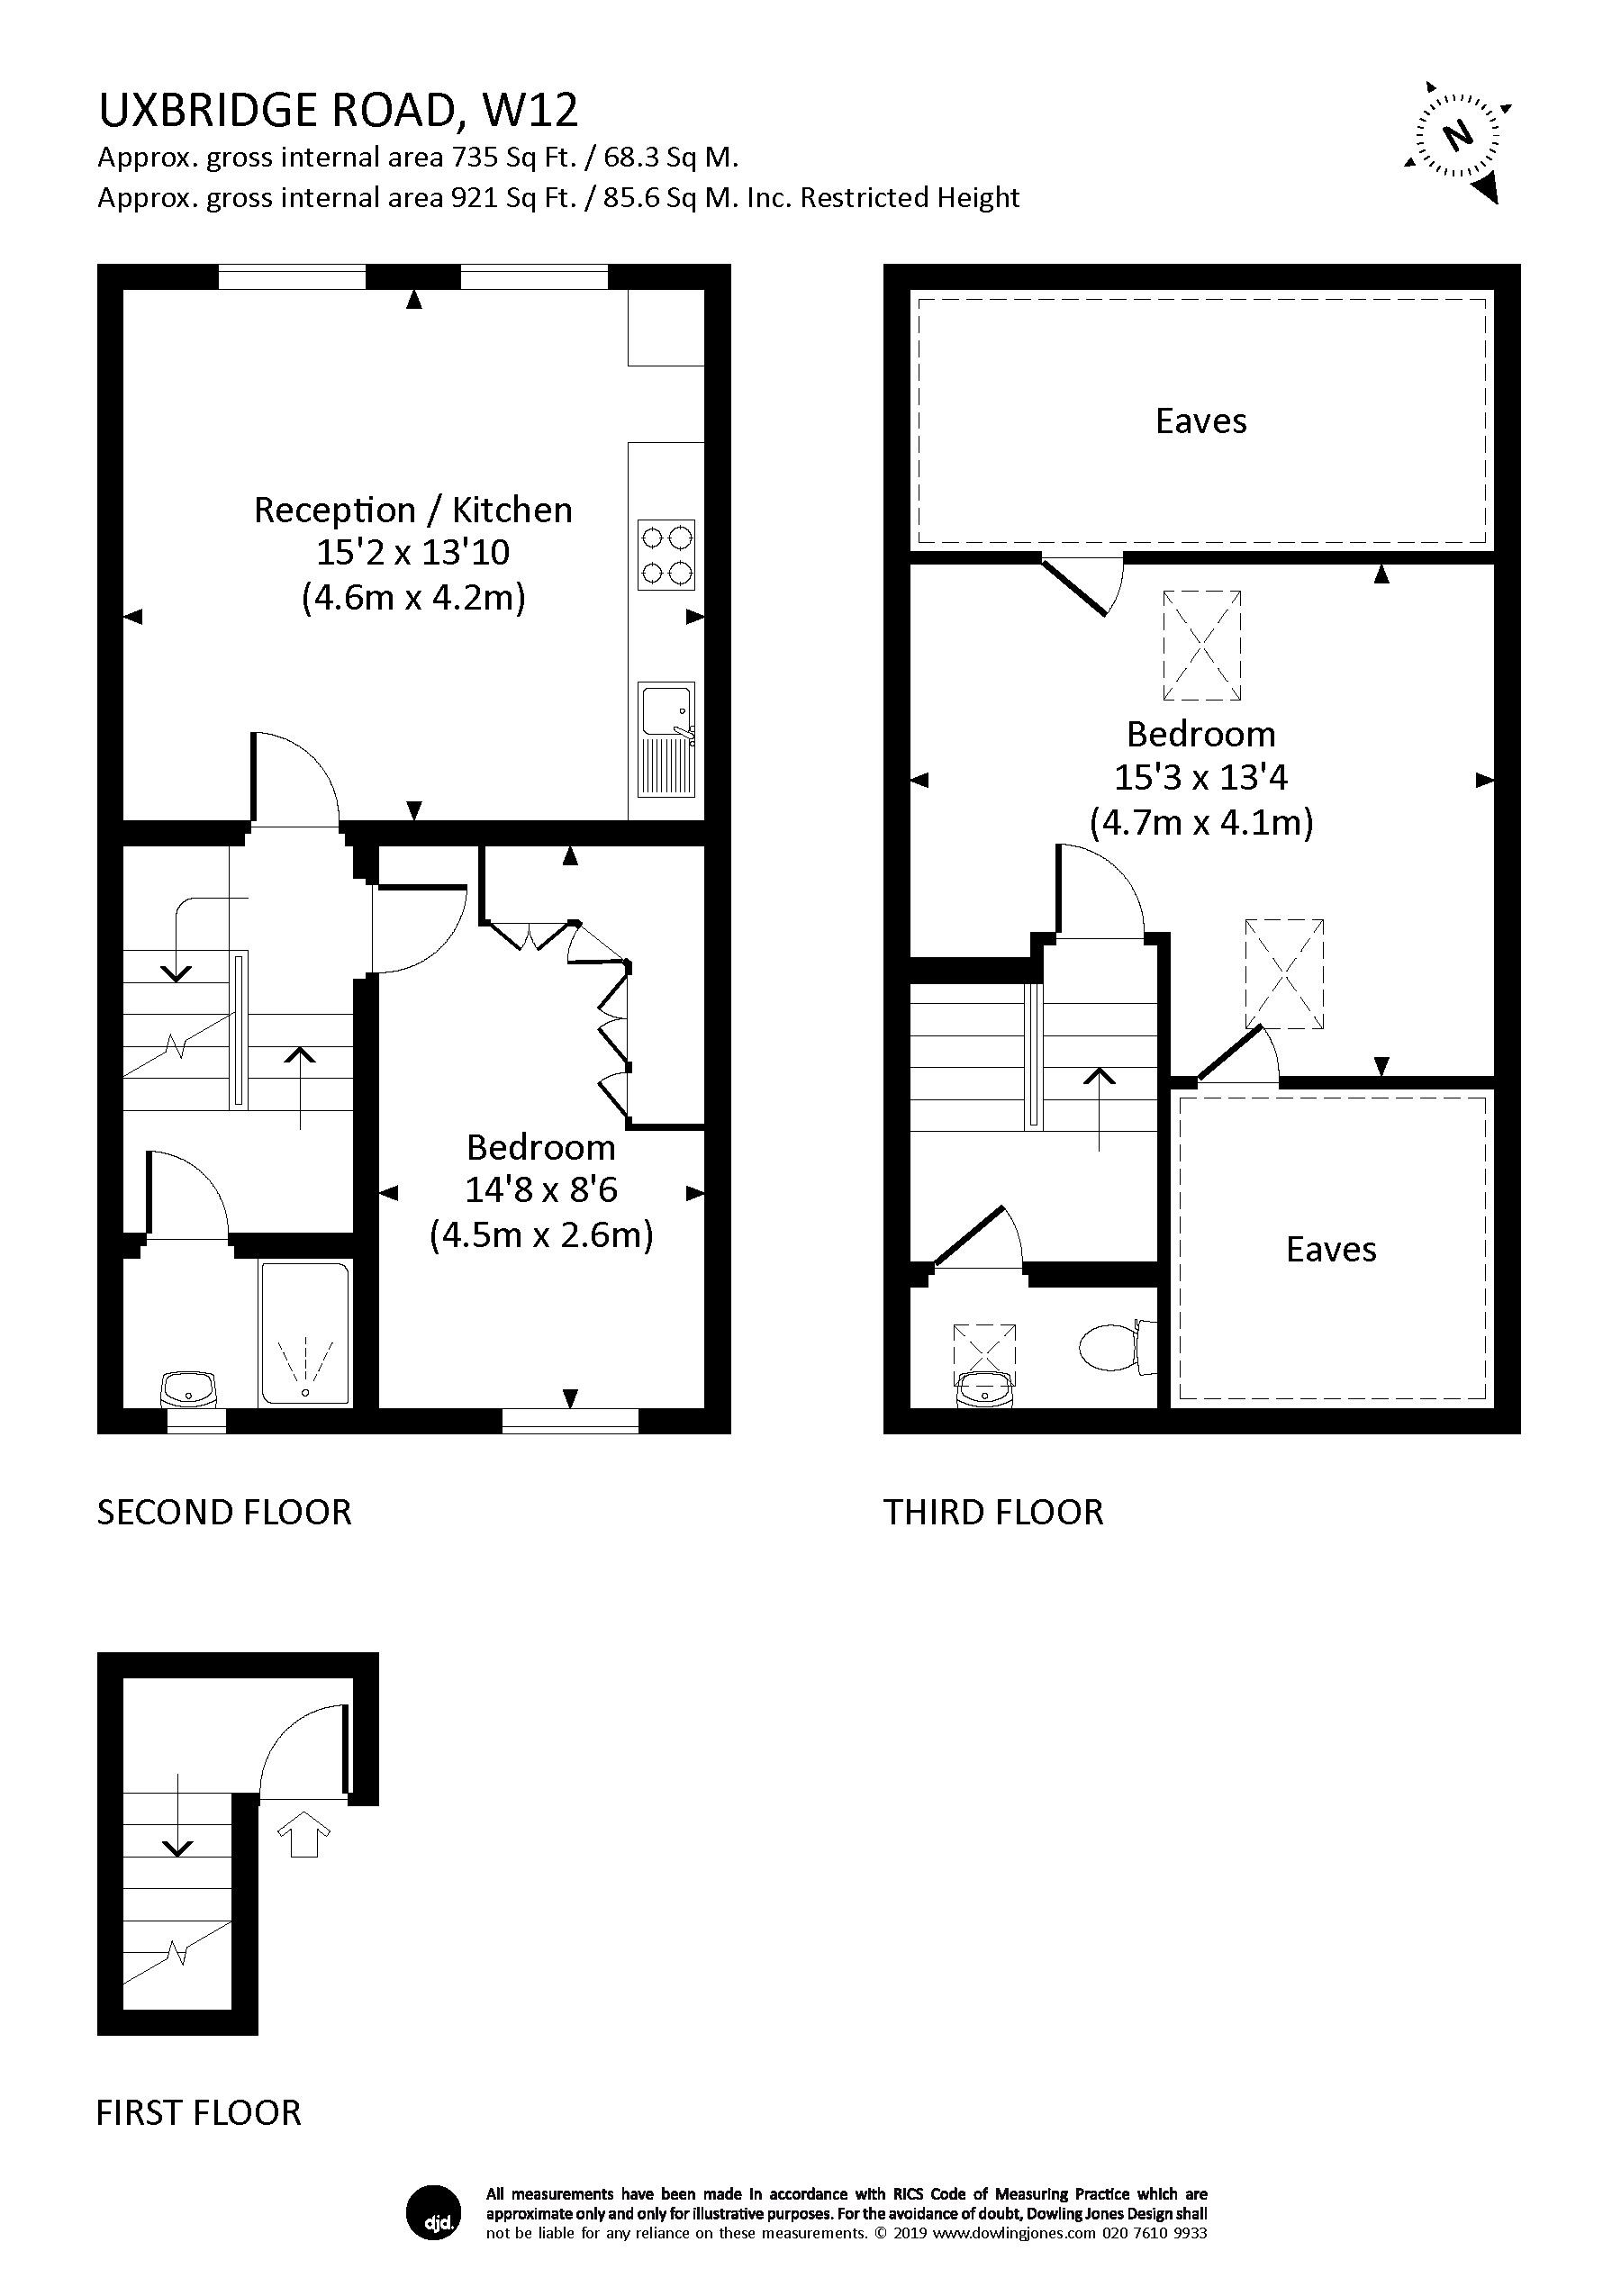 2 Bedroom Property For Sale In Uxbridge Road London W12